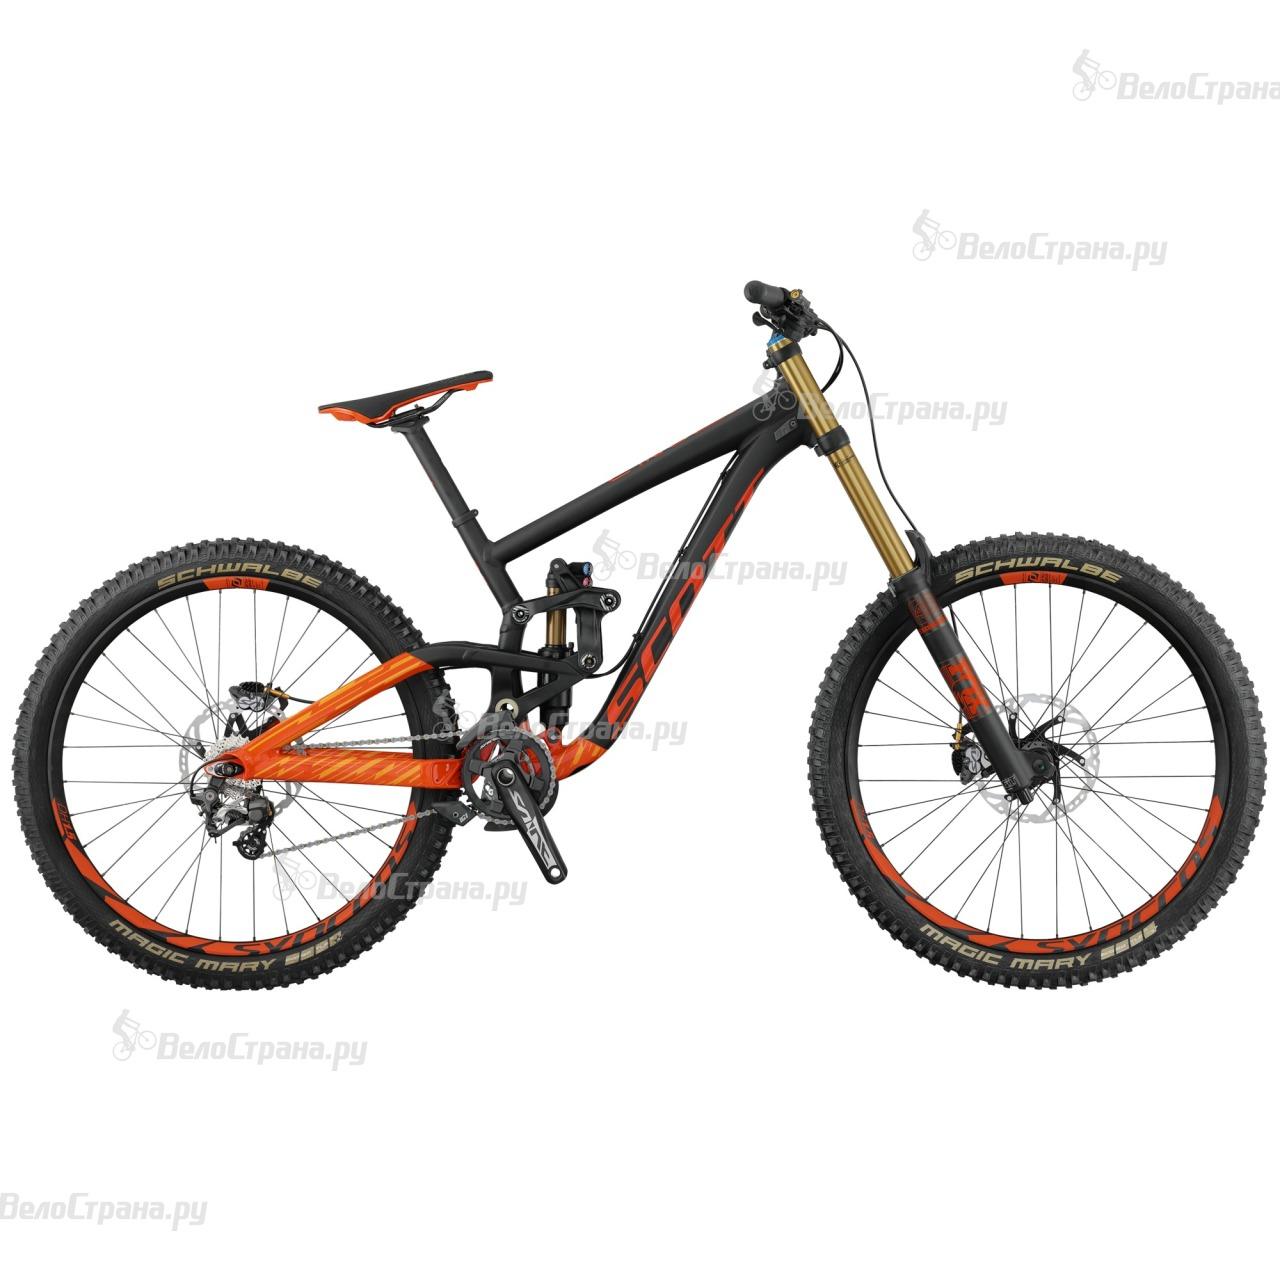 Велосипед Scott Gambler 710 (2017) велосипед scott gambler 720 2015